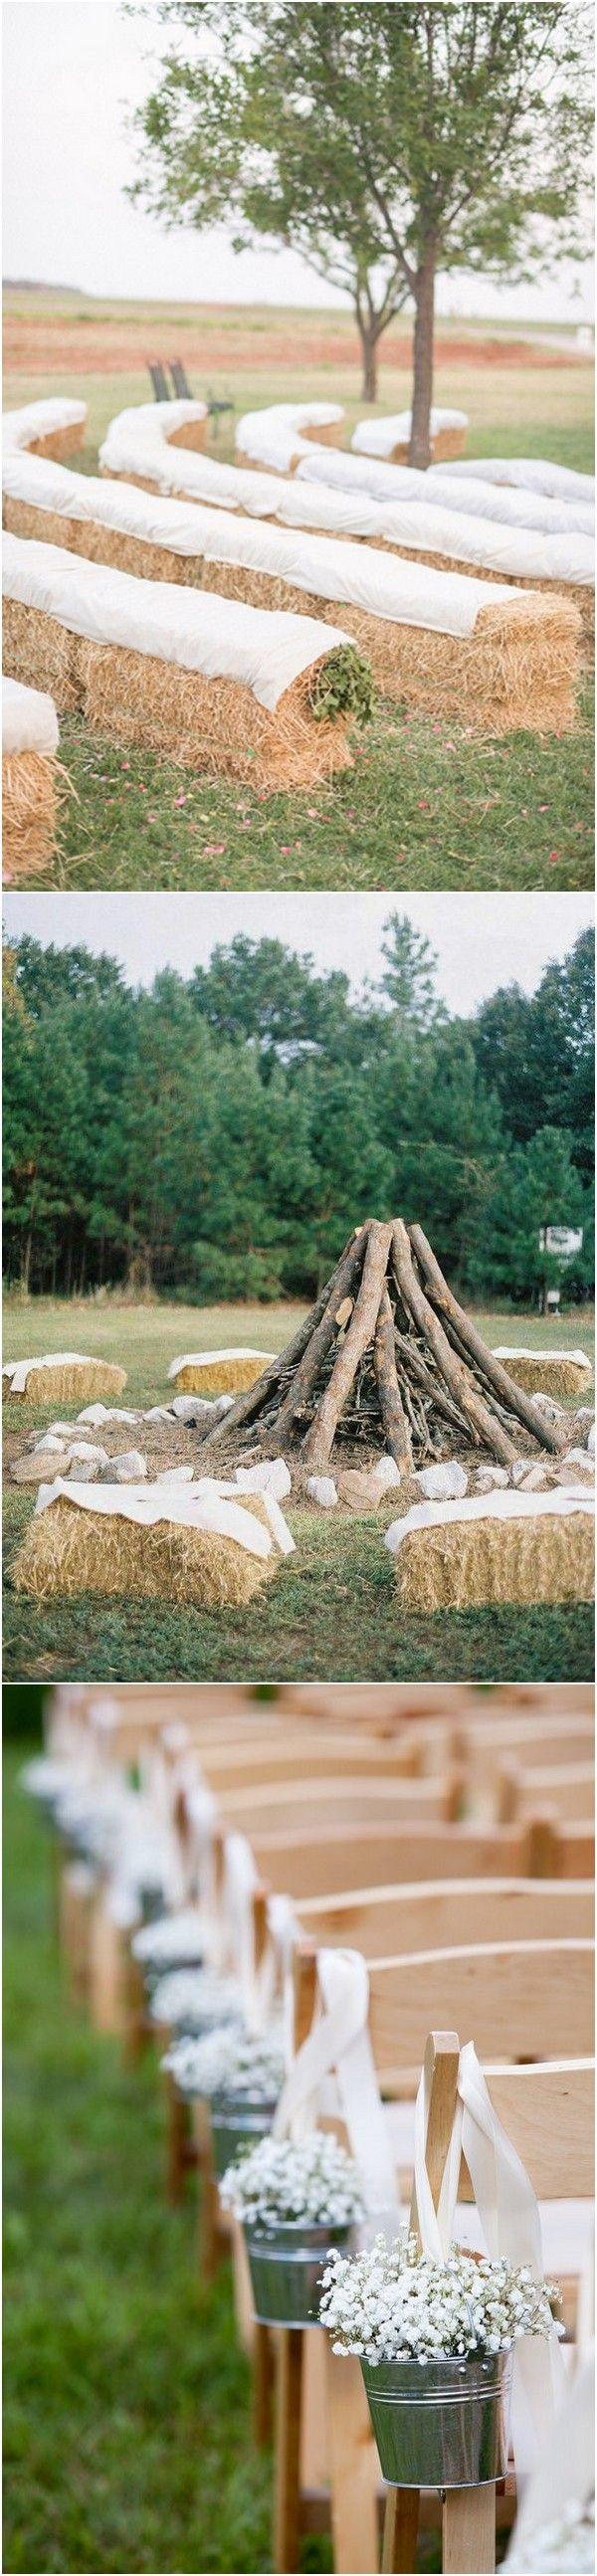 best 25 bonfire decorations ideas on pinterest outdoor fall